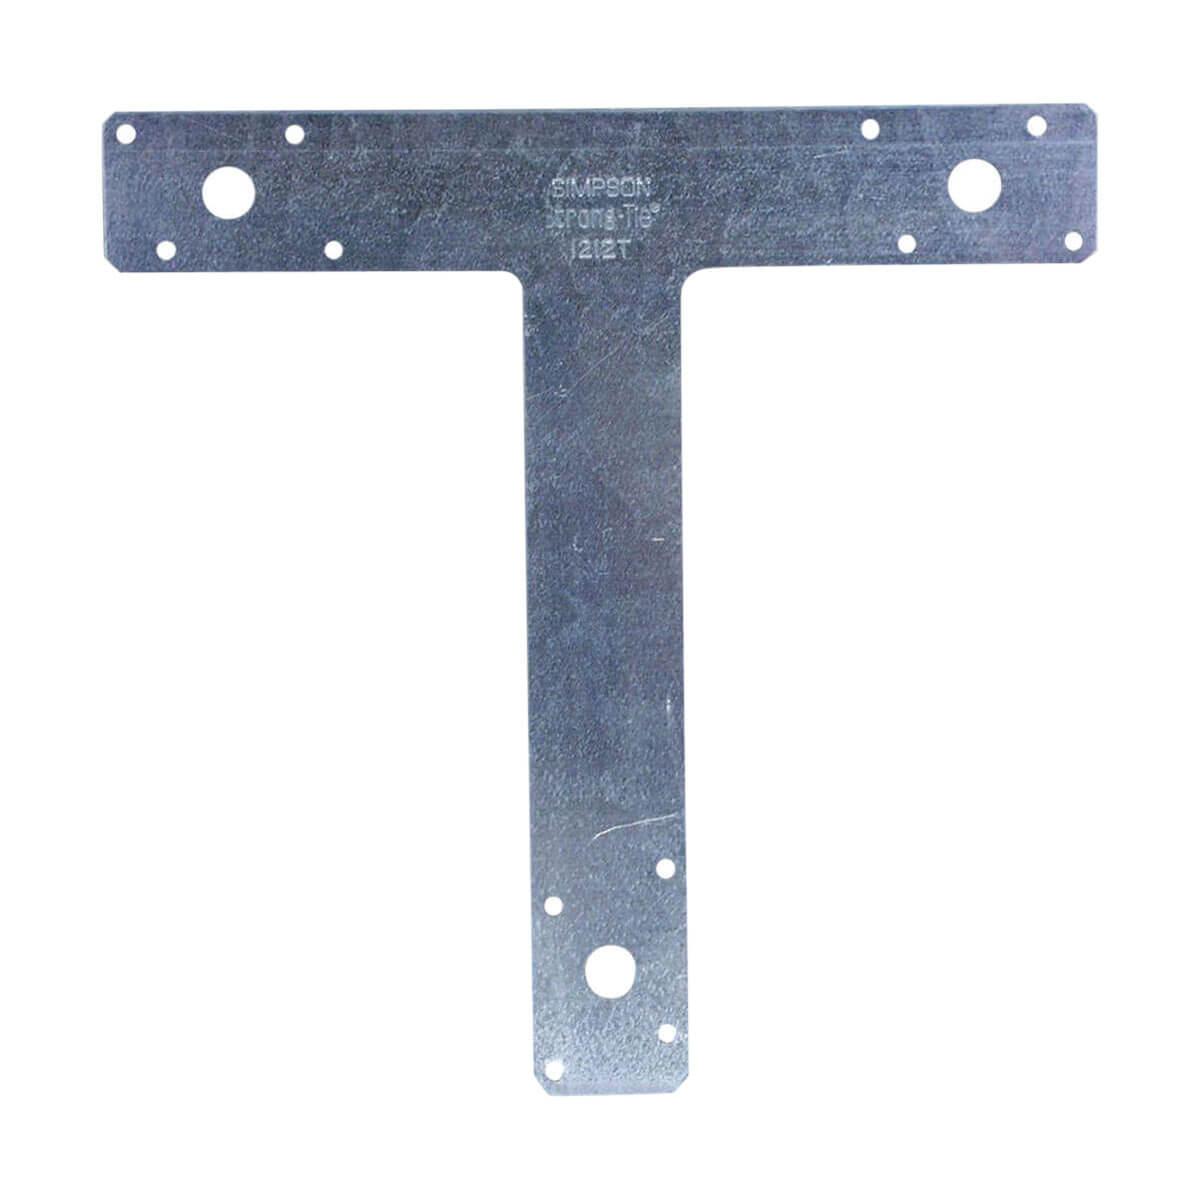 T Strap - 14 Gauge - 6-in x 6-in